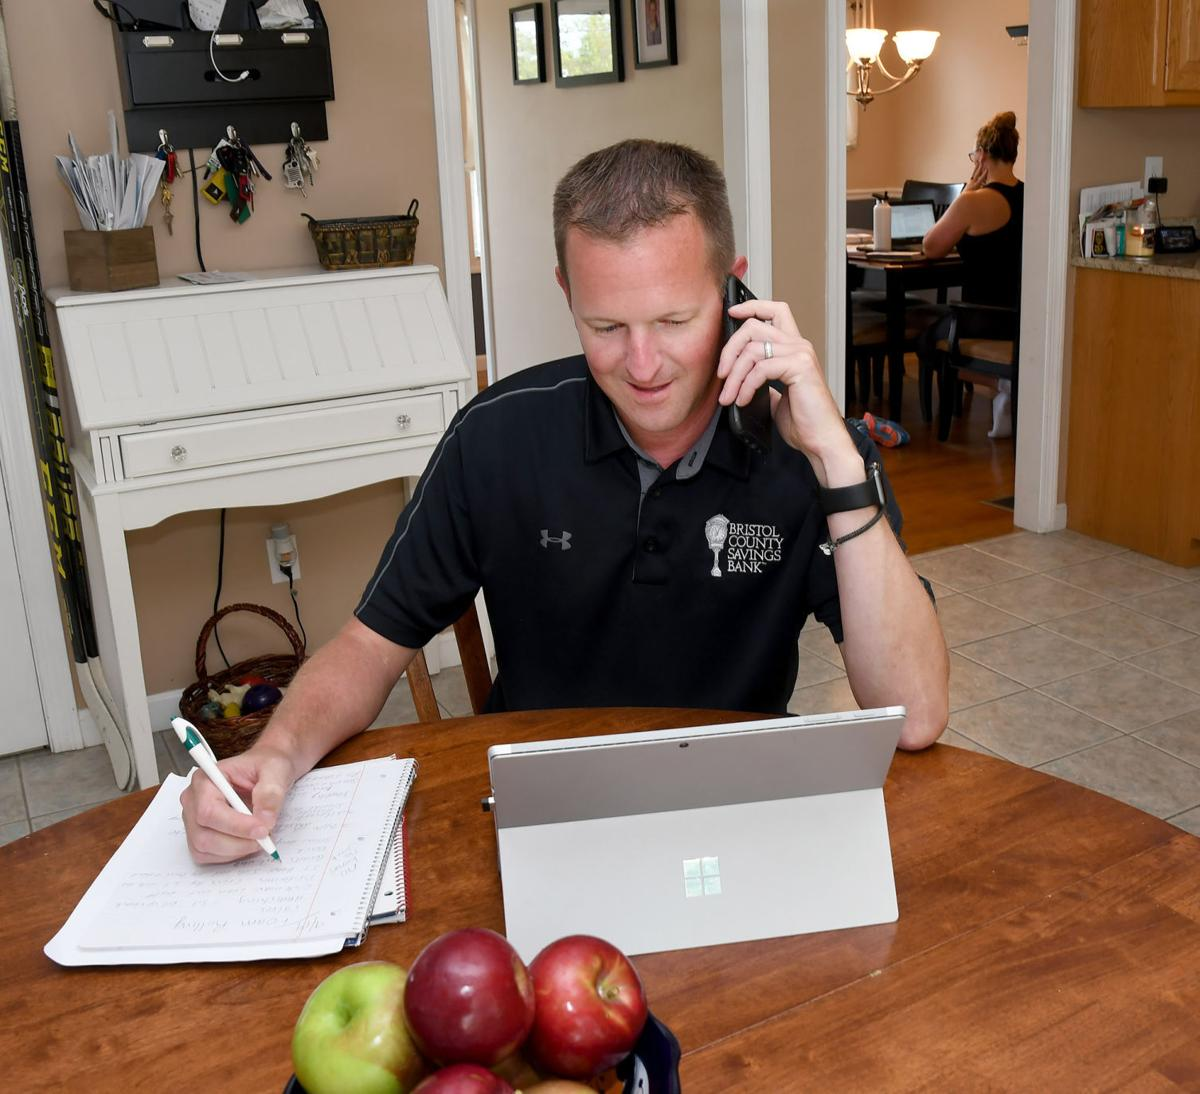 Bradley, Jeff Work at Home